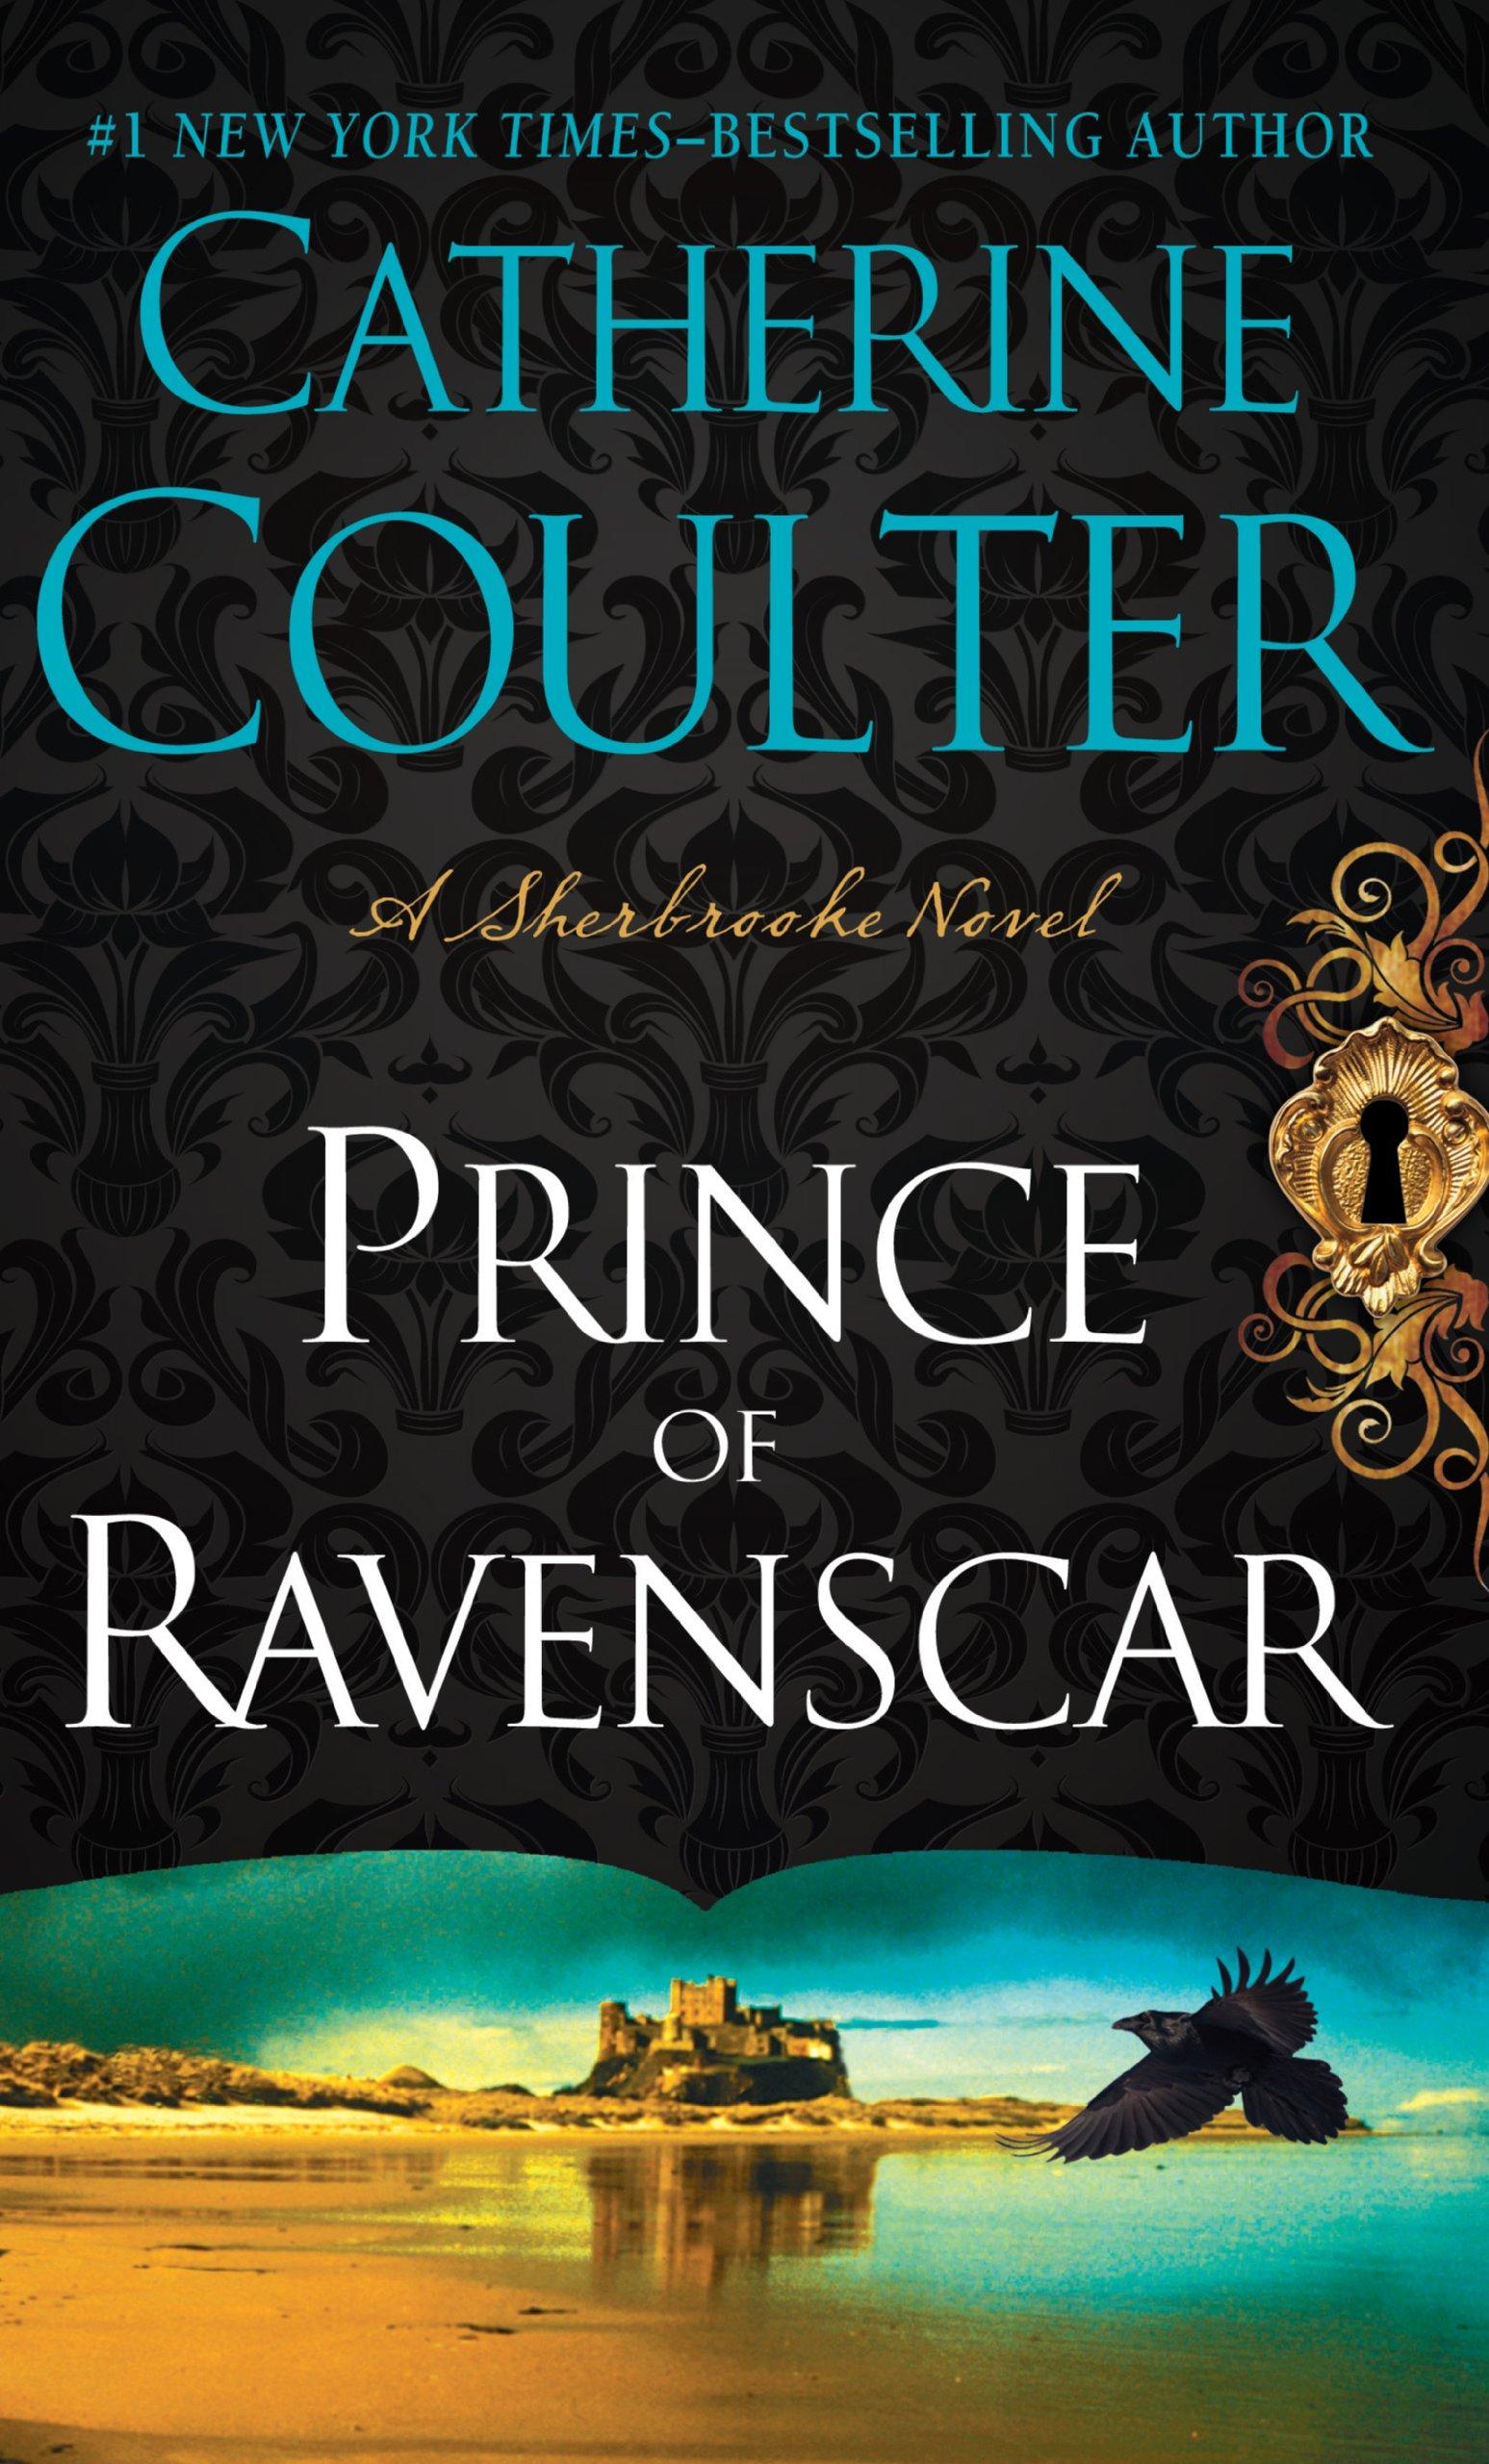 Download Prince of Ravenscar (Thorndike Press Large Print Core Series) ebook